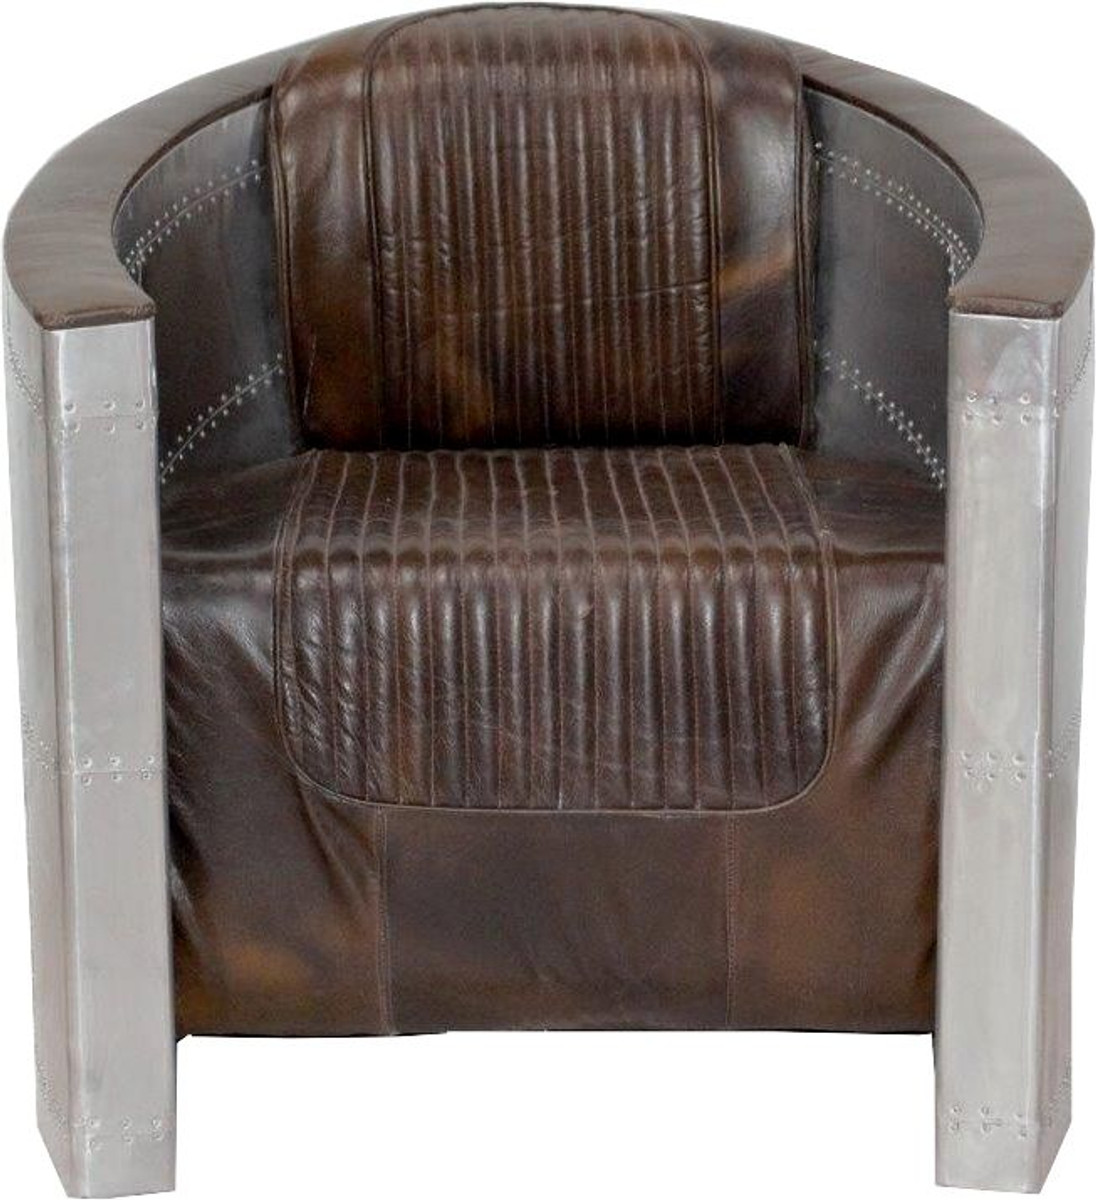 Lounge sessel braun  Casa Padrino Art Deco Aluminium Sessel Echtleder Braun - Club Sessel ...